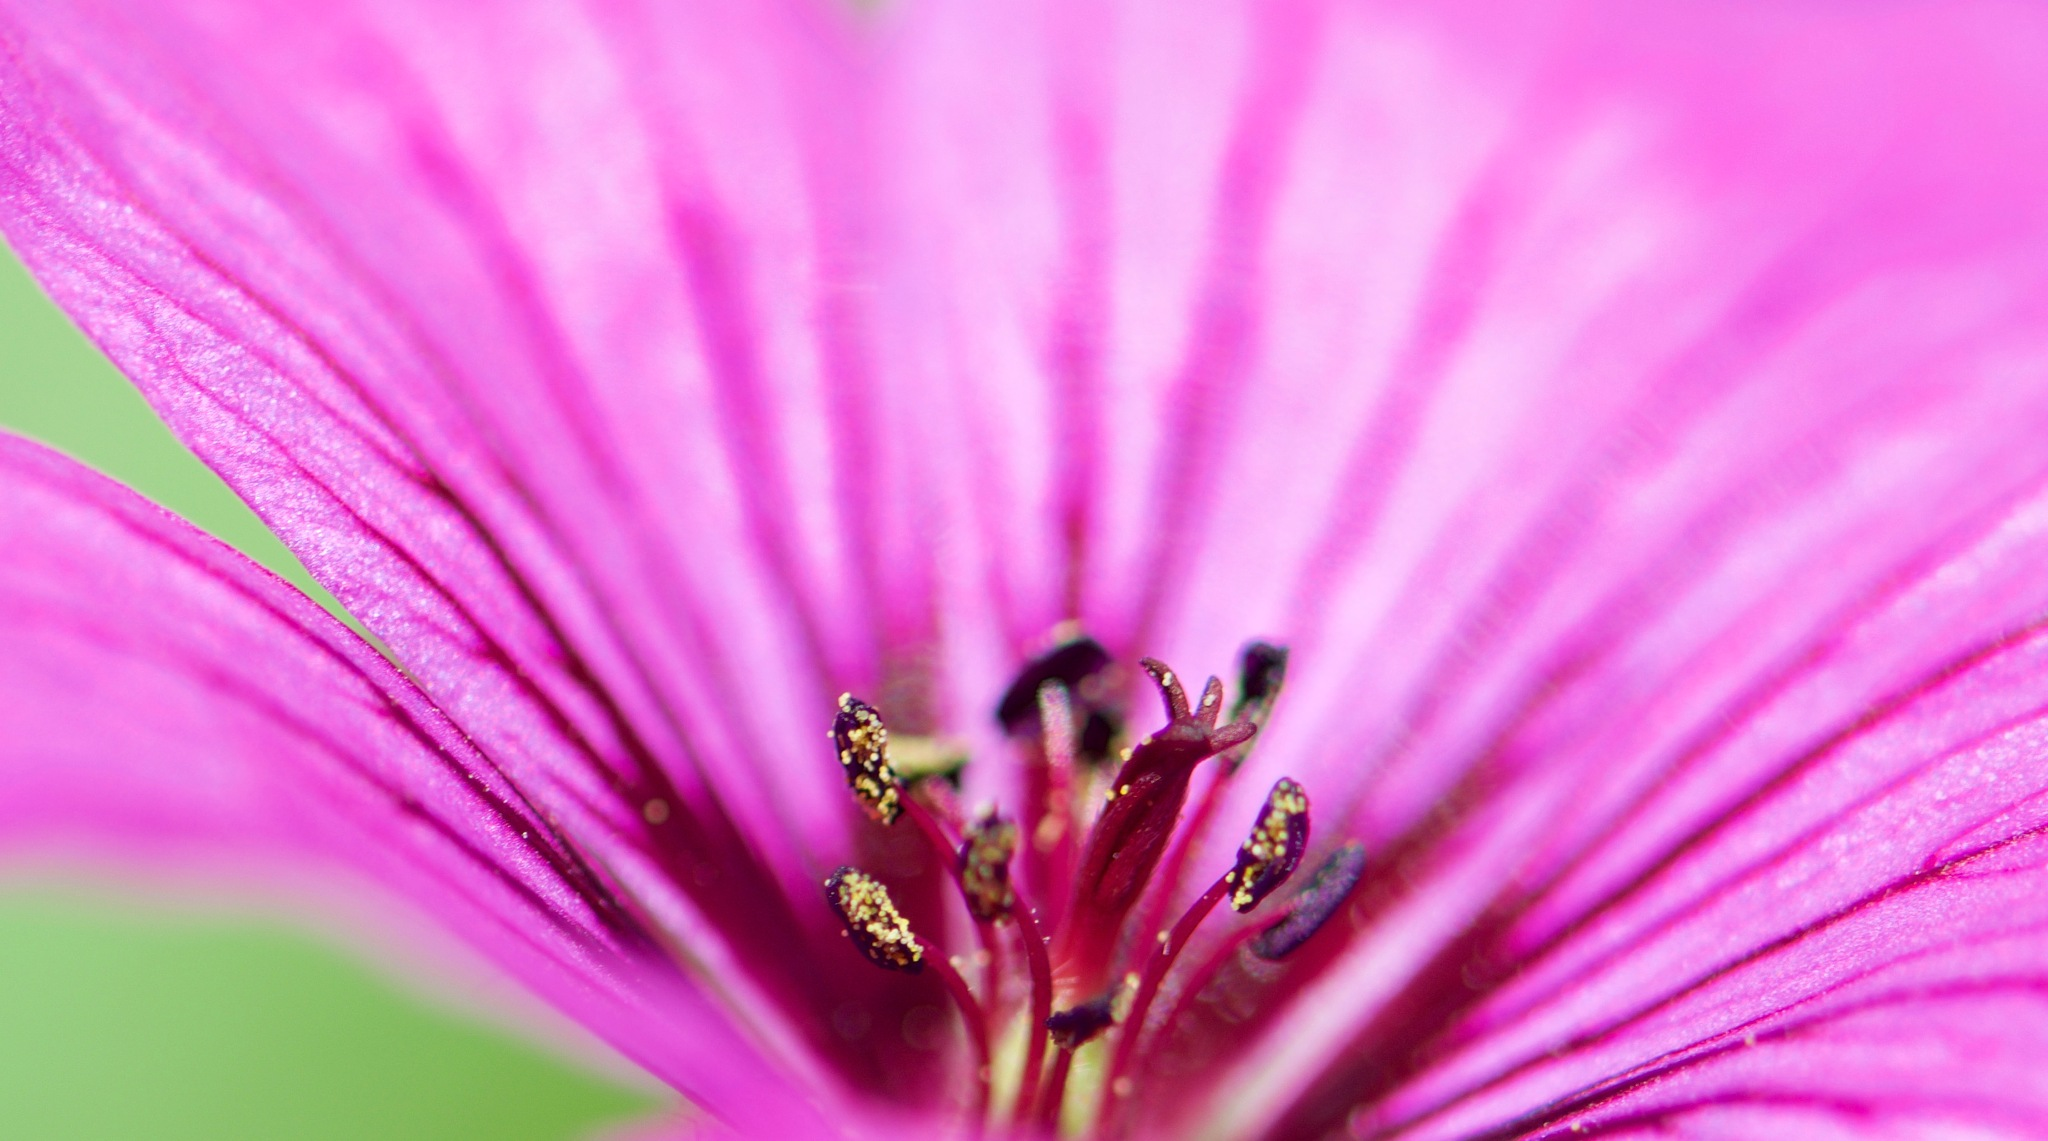 Macro Flowers 178! by Memed Bayatli